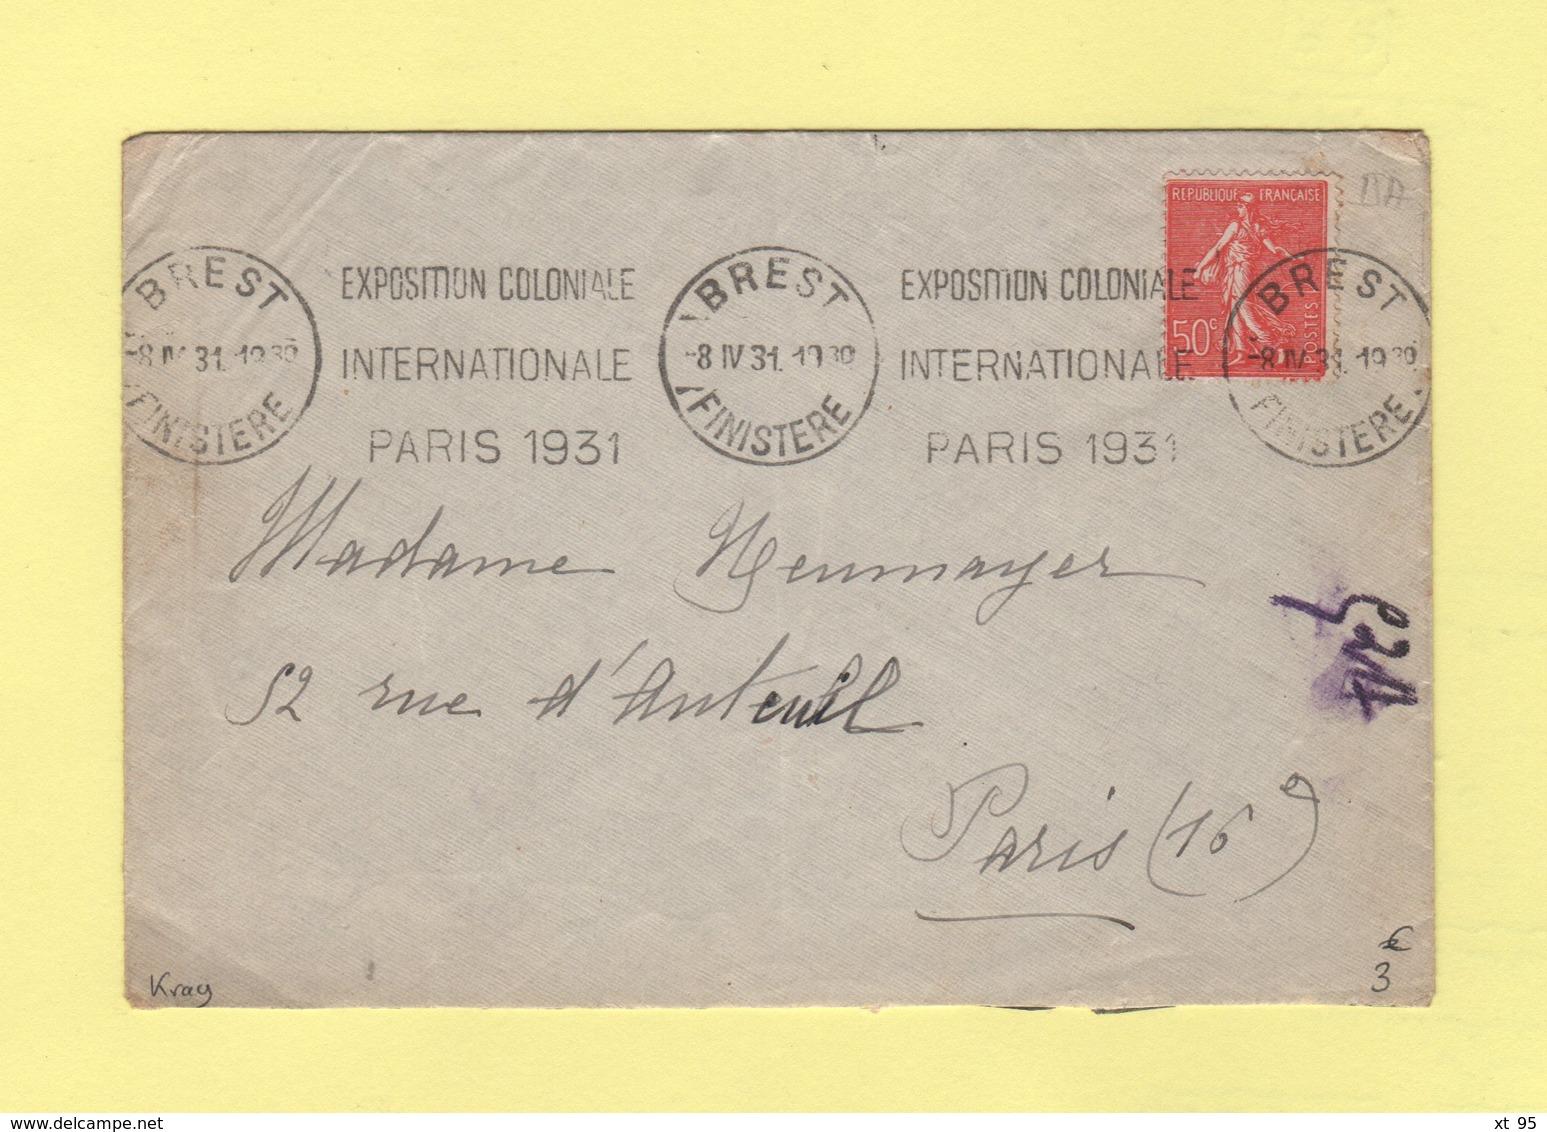 Krag - Brest - Exposition Coloniale Internationale Paris 1931 - Postmark Collection (Covers)